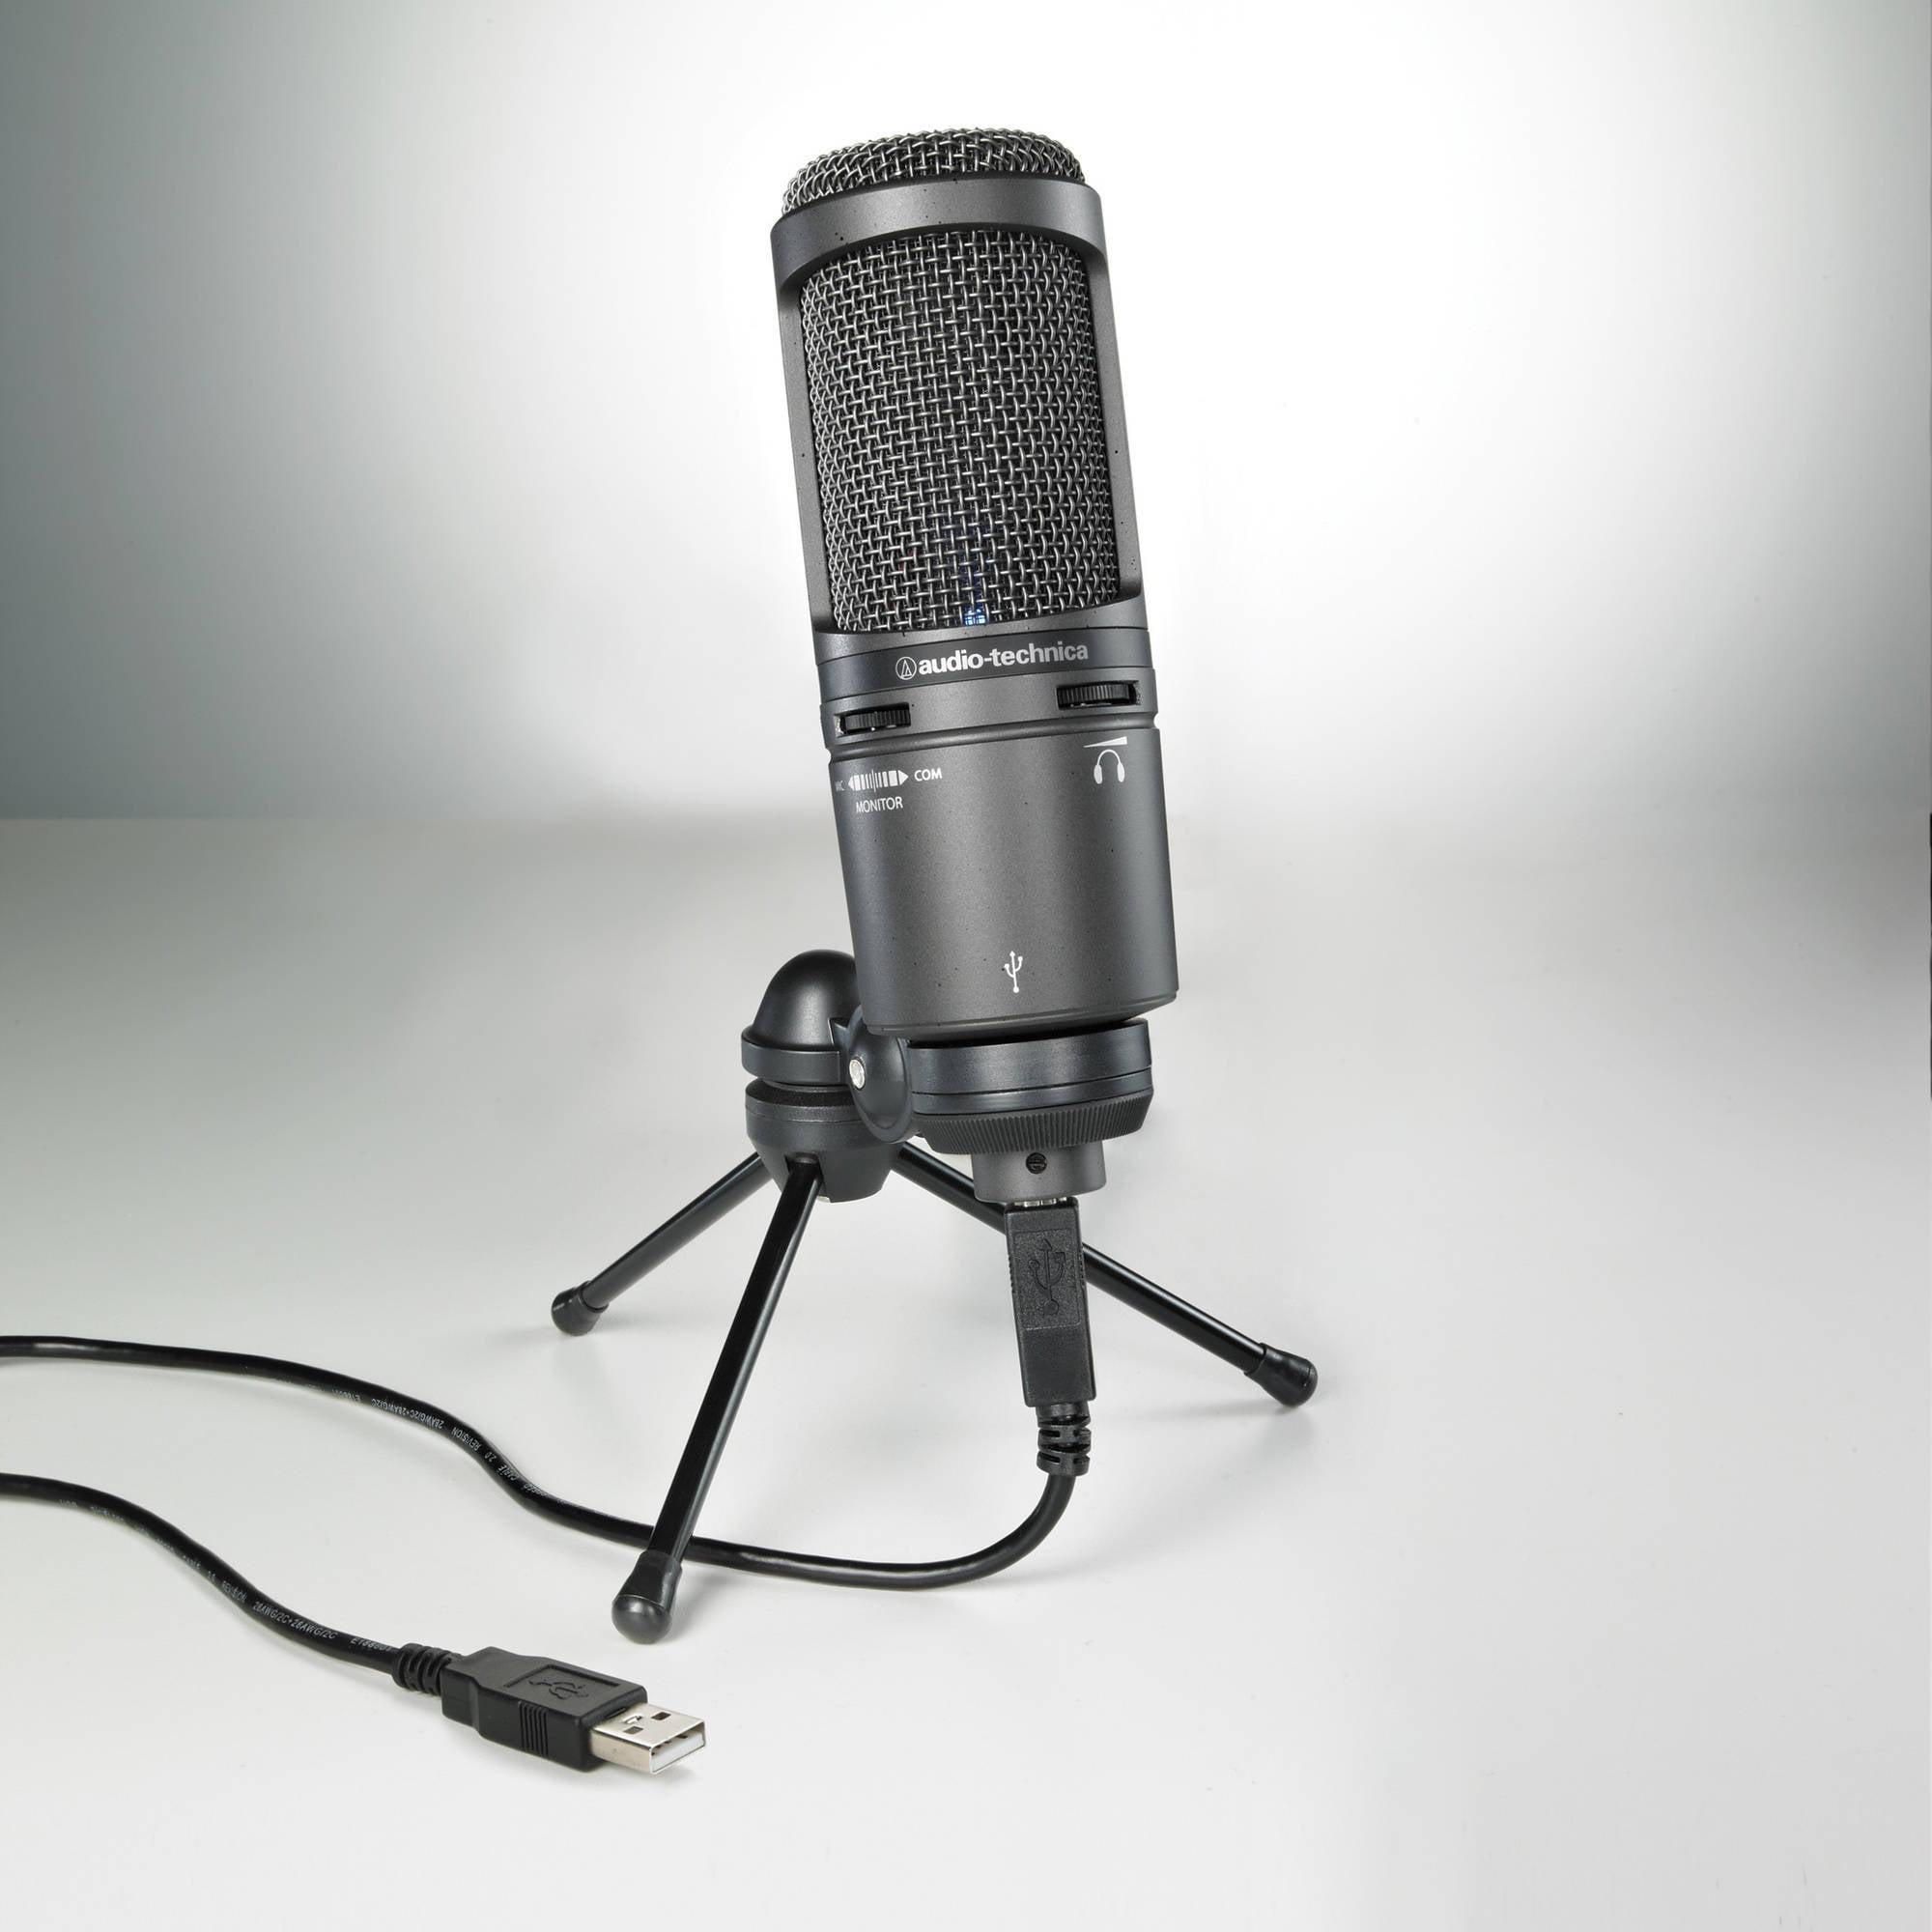 Audio Technica AT2020USB Plus Cardioid Large Diaphragm Condenser USB Mic by Audio-Technica